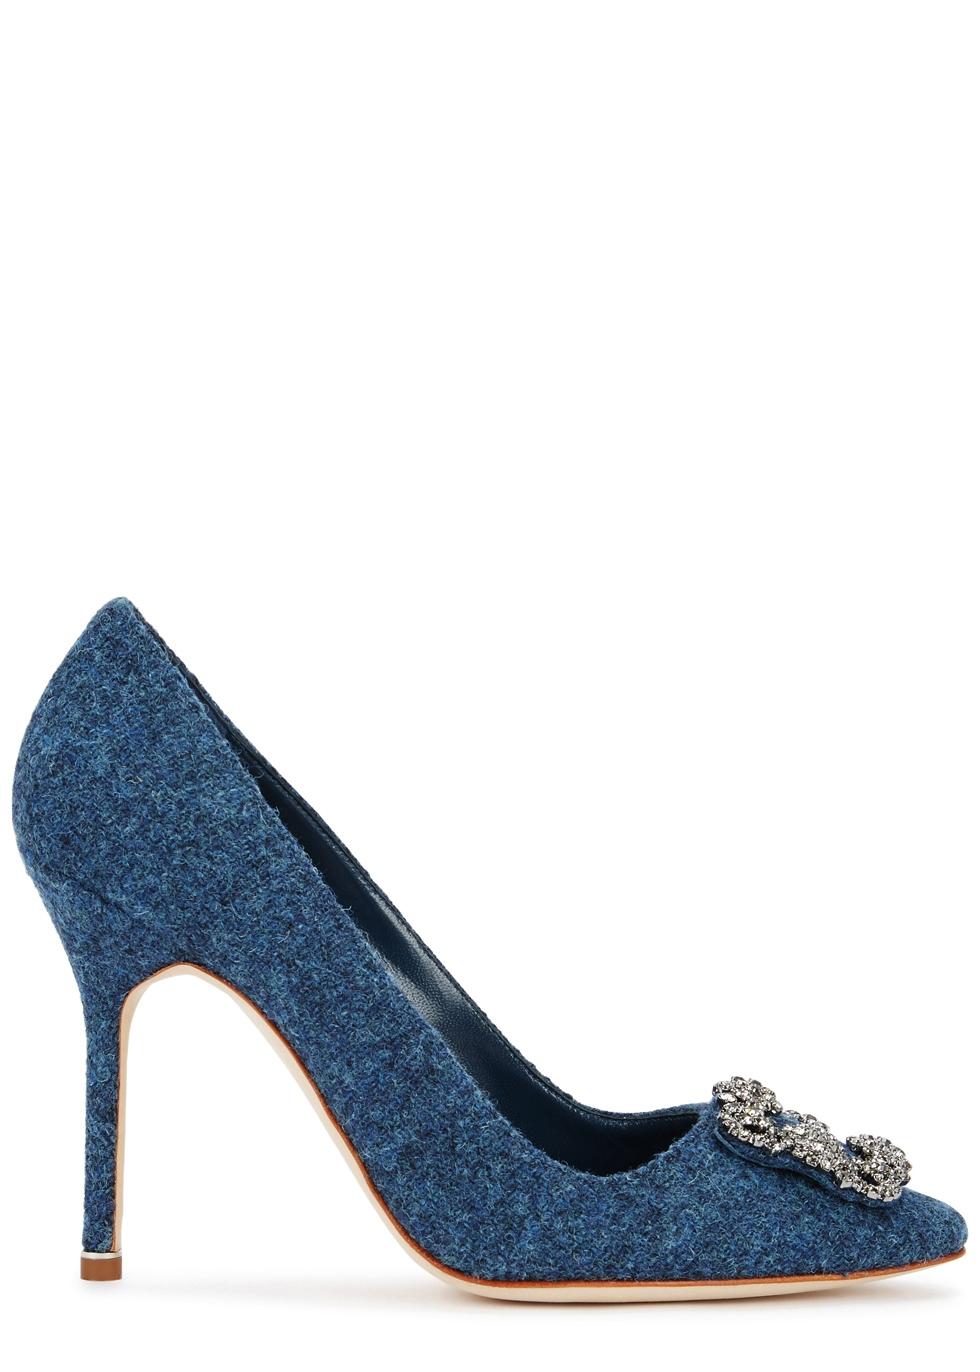 MANOLO BLAHNIK HANGISI 105 BLUE FELT PUMPS